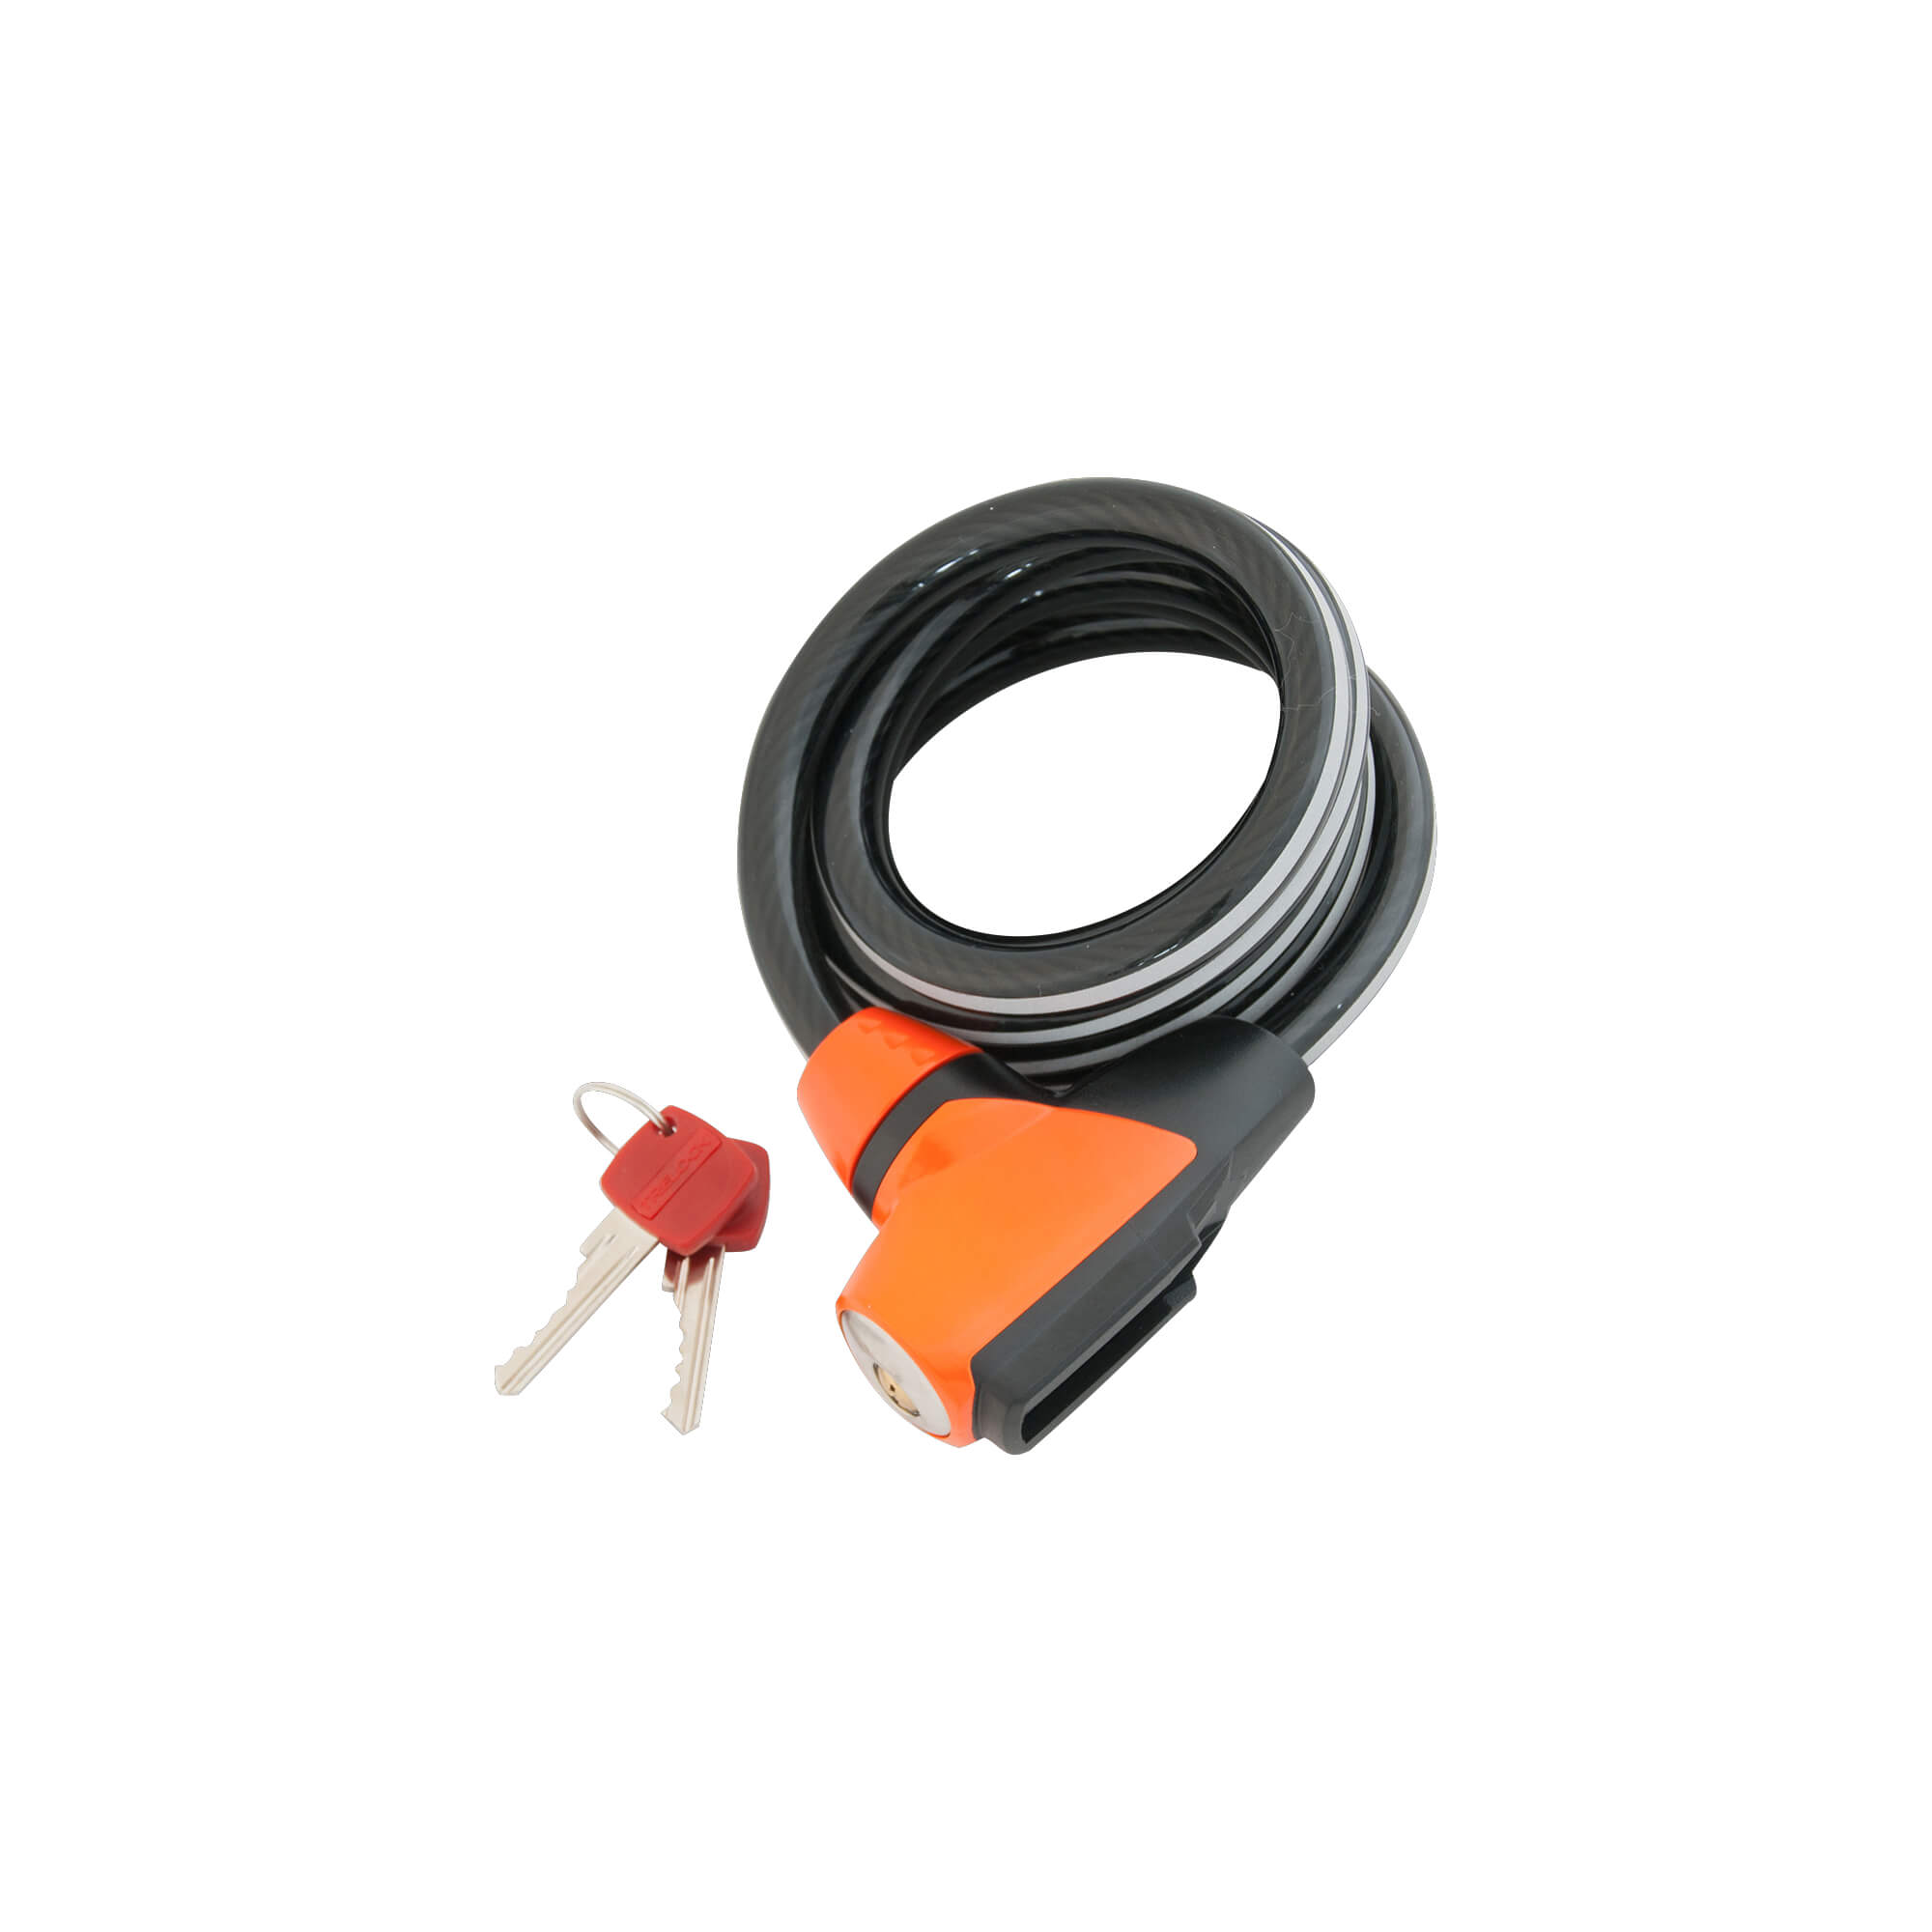 Cable Lock Key imagine